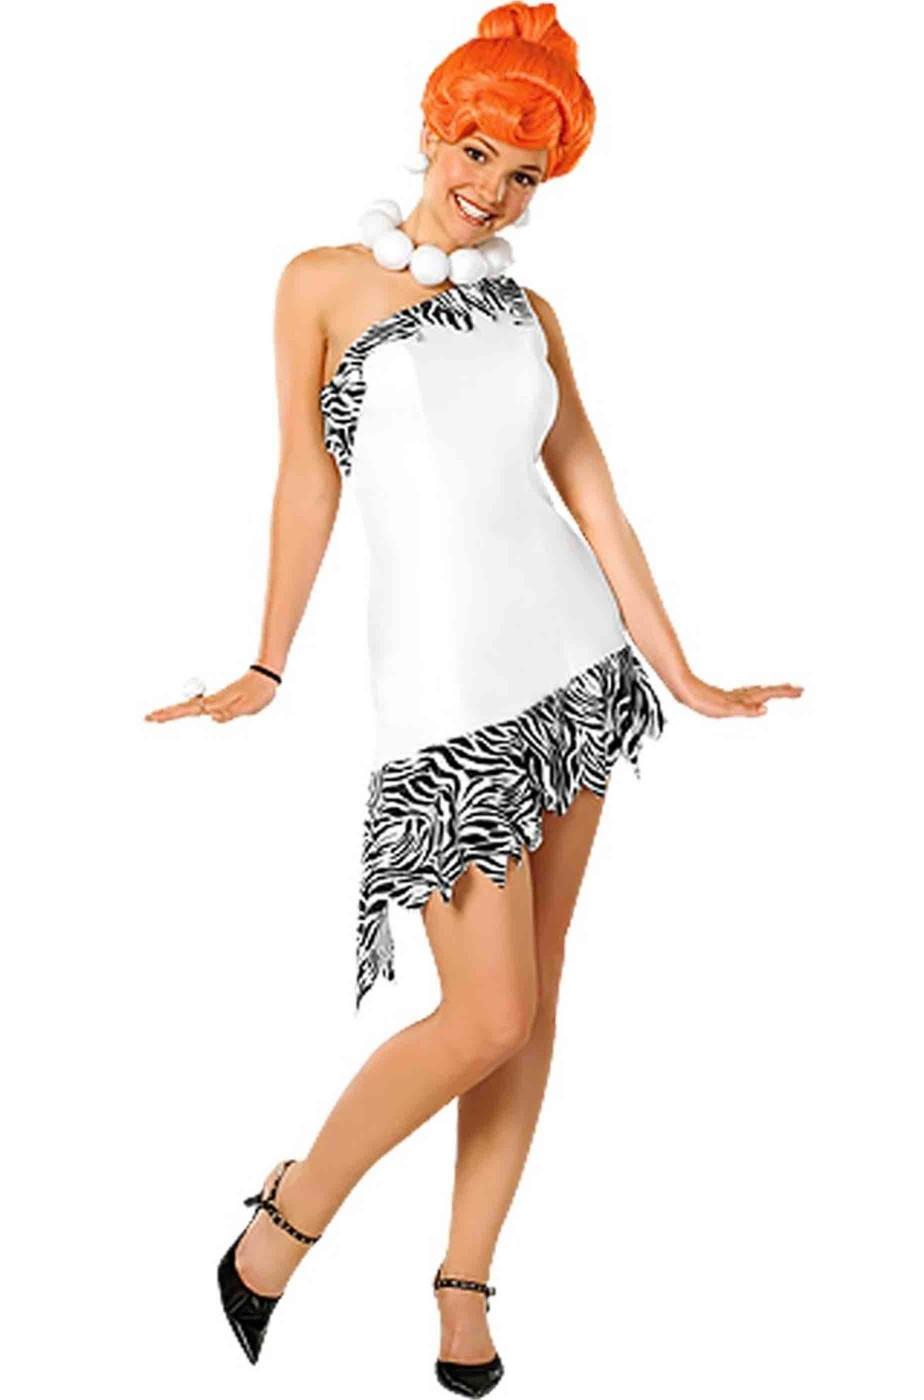 Costume Wilma Flintstone de Luxe con collana e parrucca